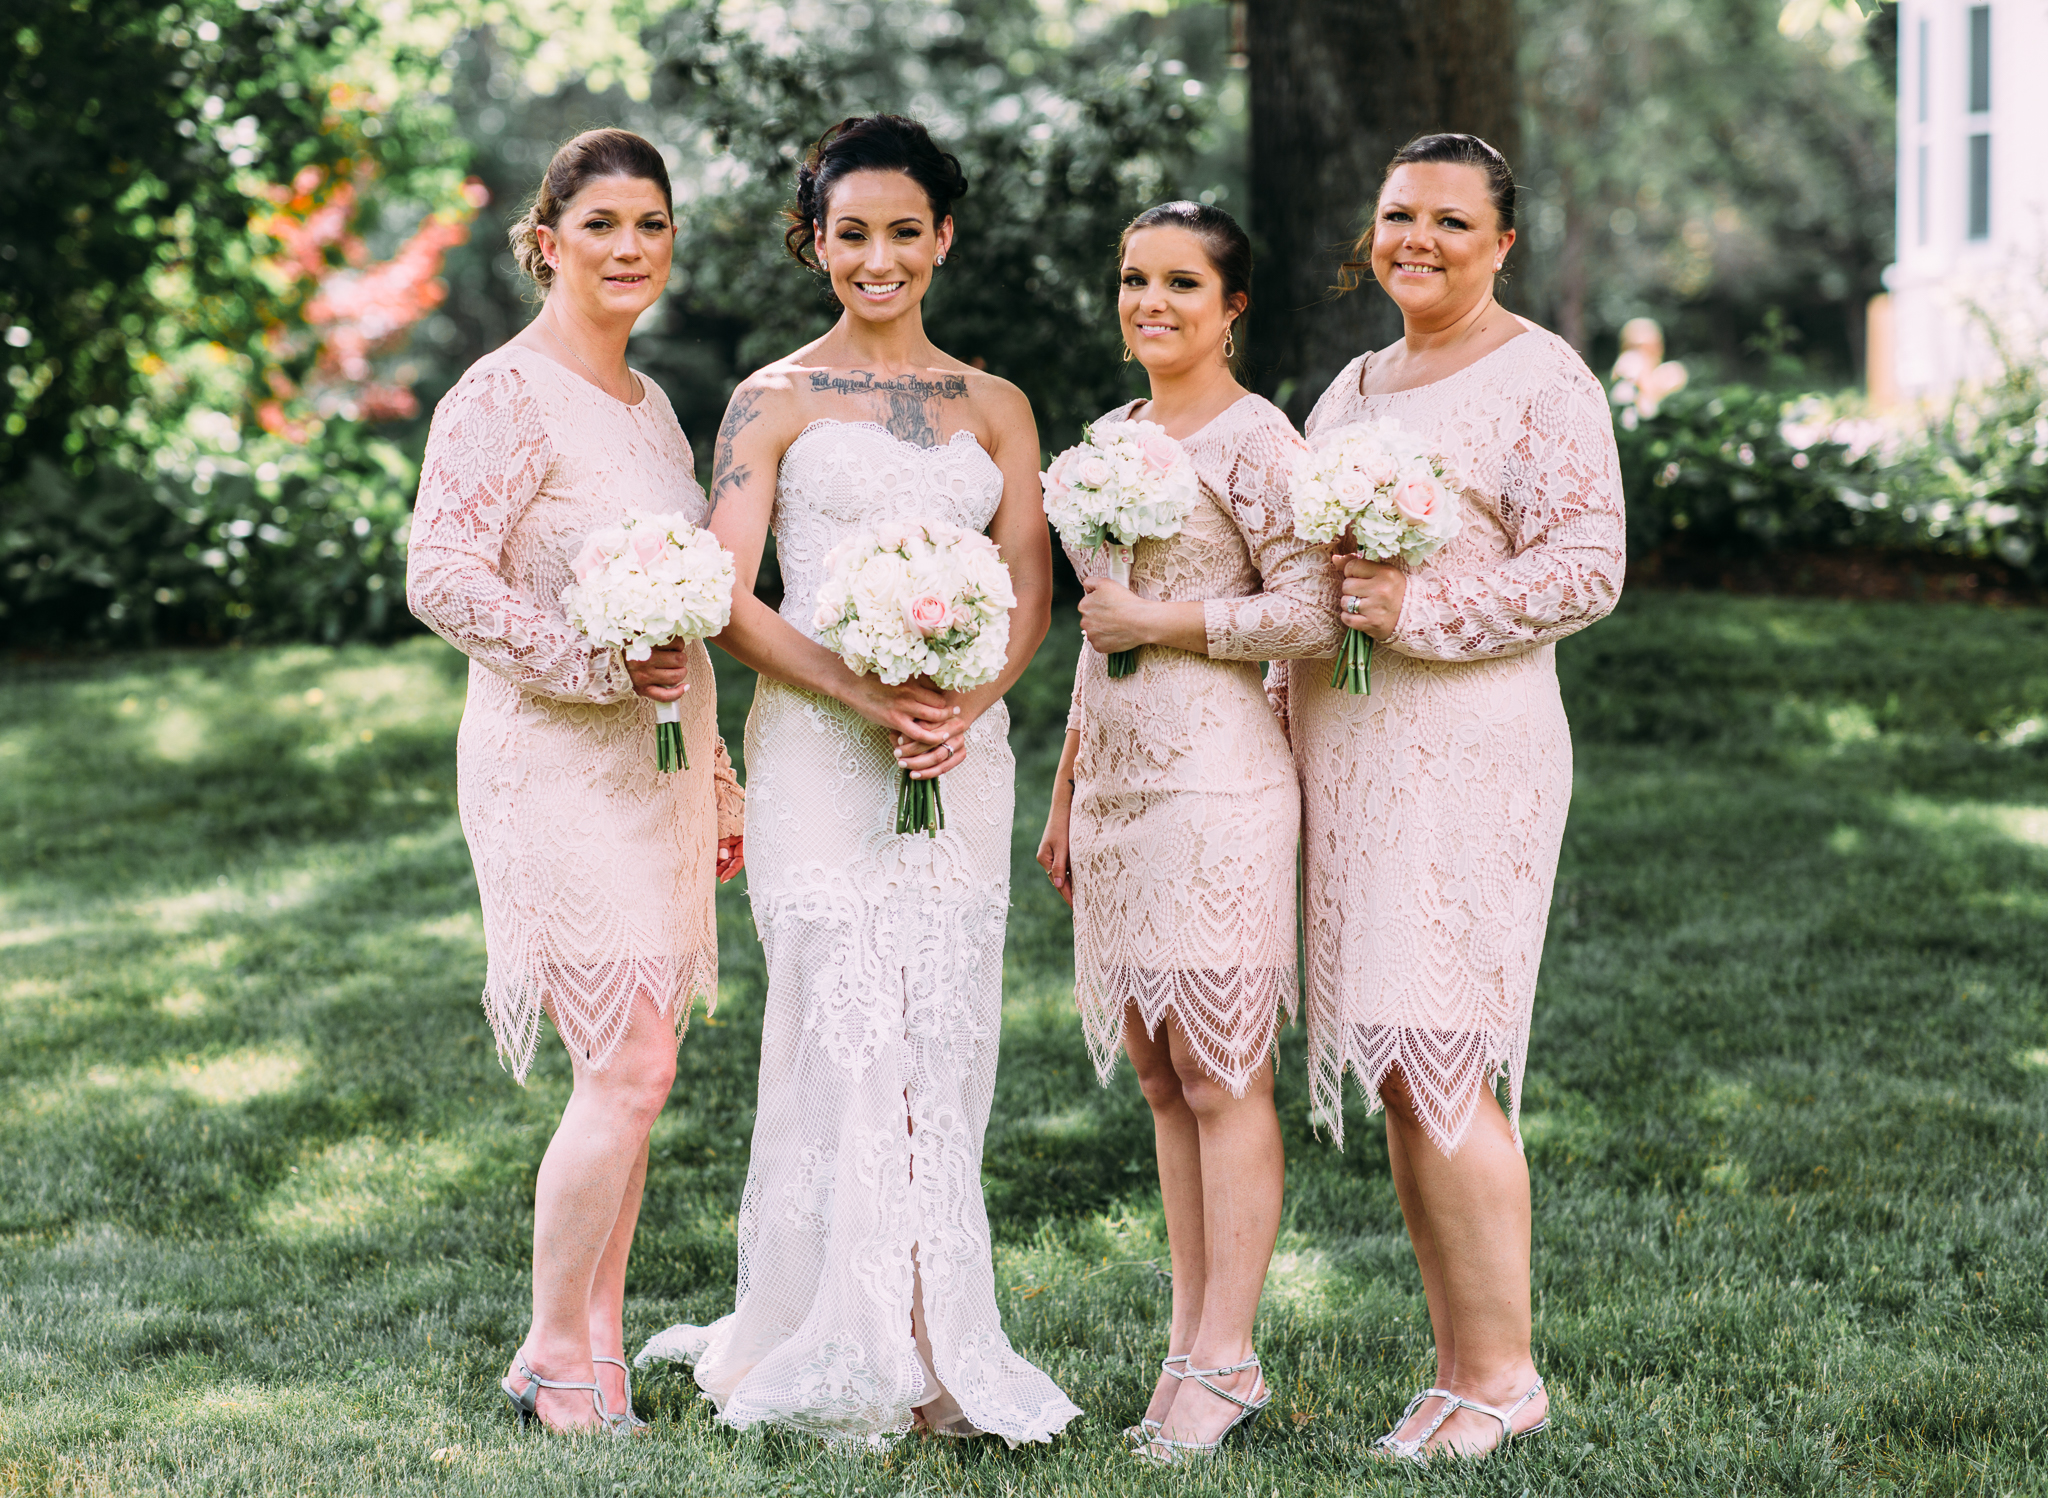 maine-bride-bridesmaids-photo.jpg